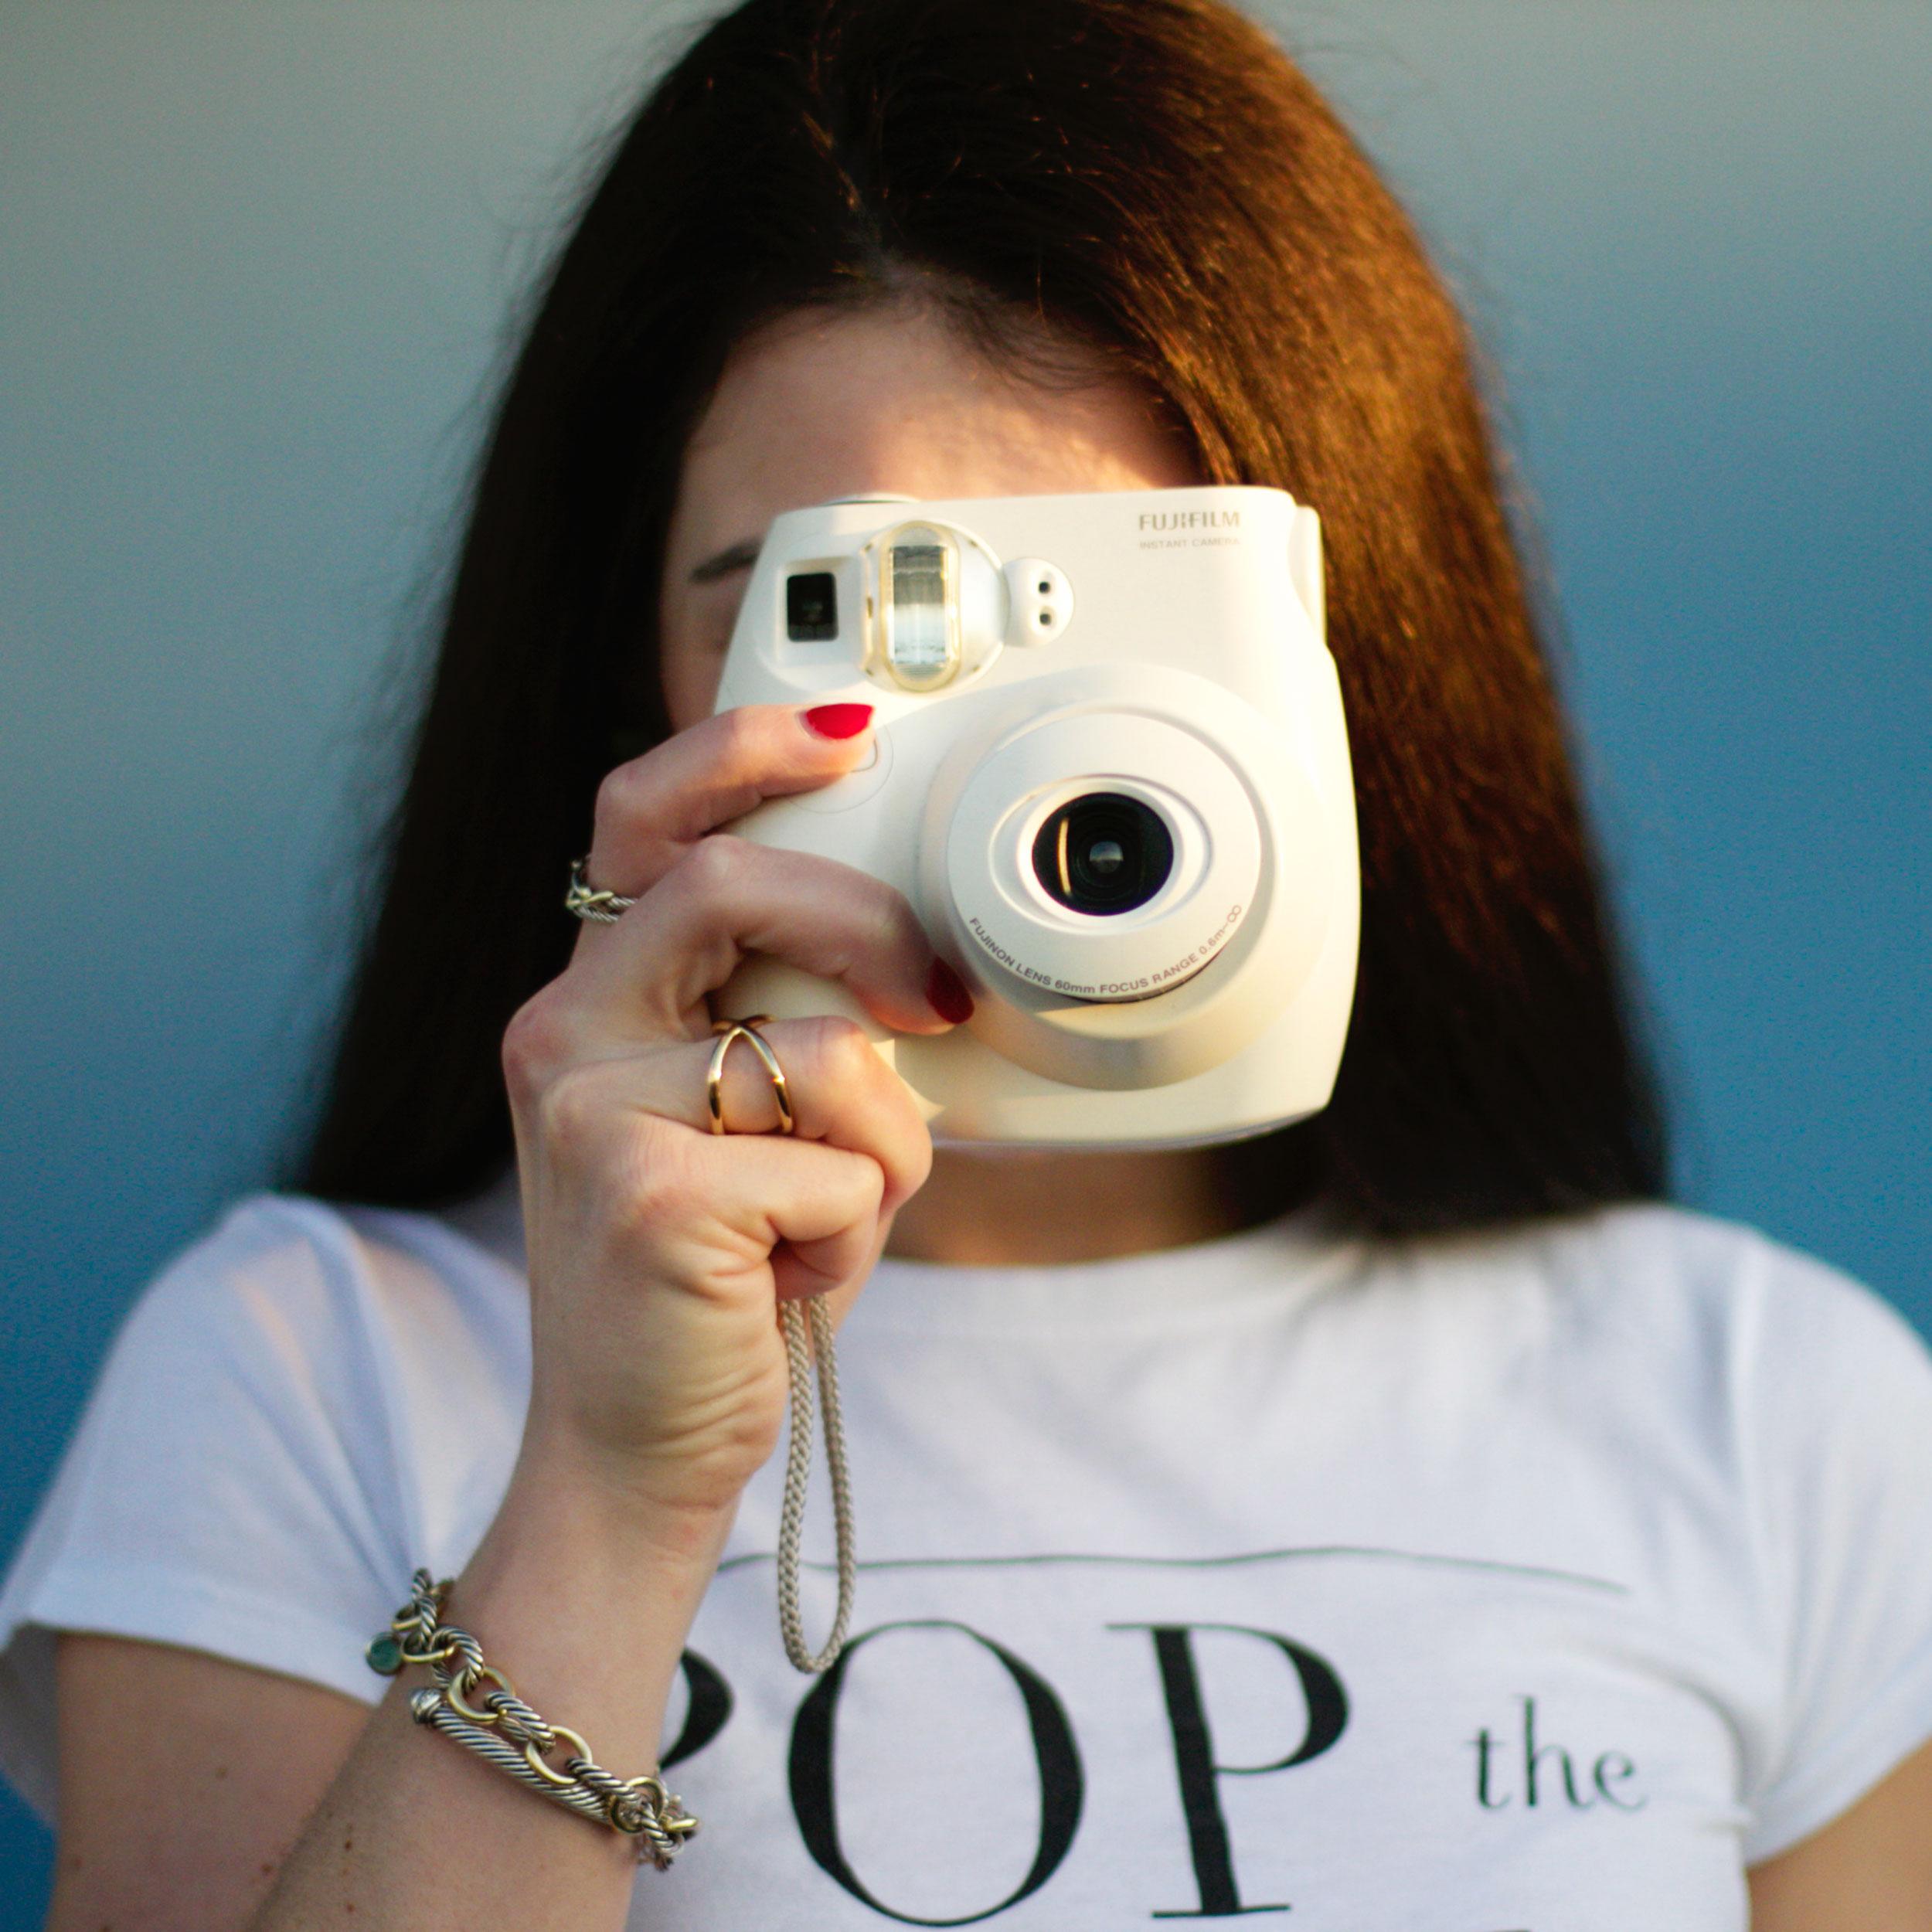 Fujifilm Instax, Polaroid, Instax Mini, Fashion Blogger, Summer Style